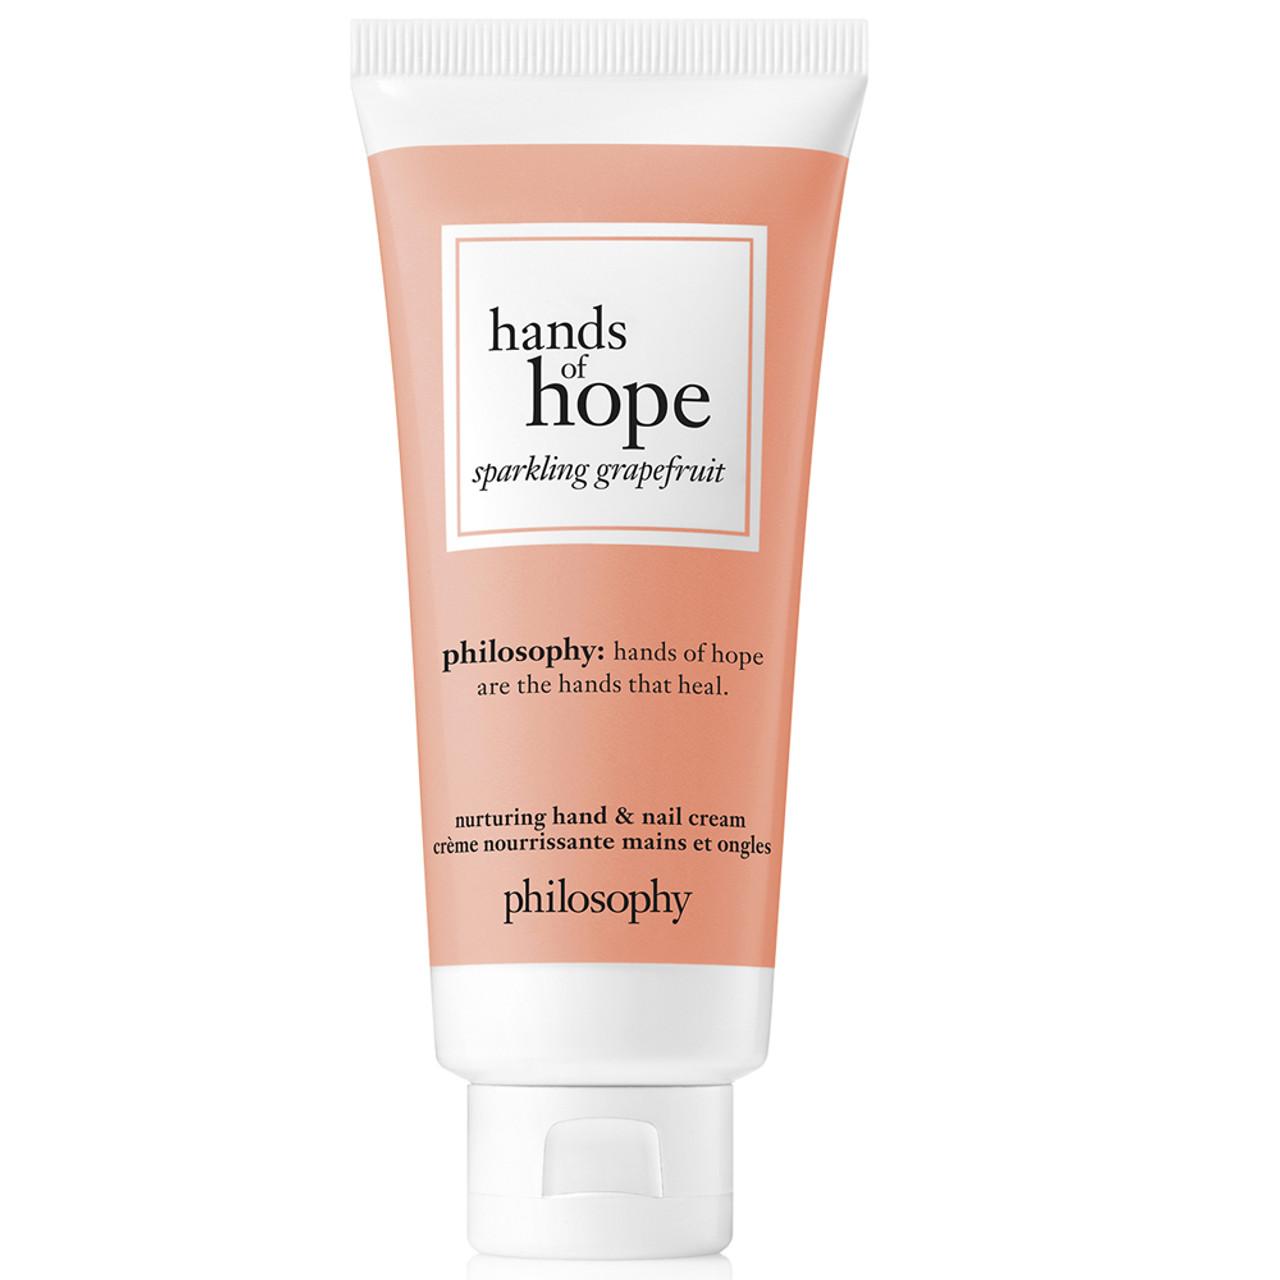 philosophy Hands of Hope Hand Cream BeautifiedYou.com